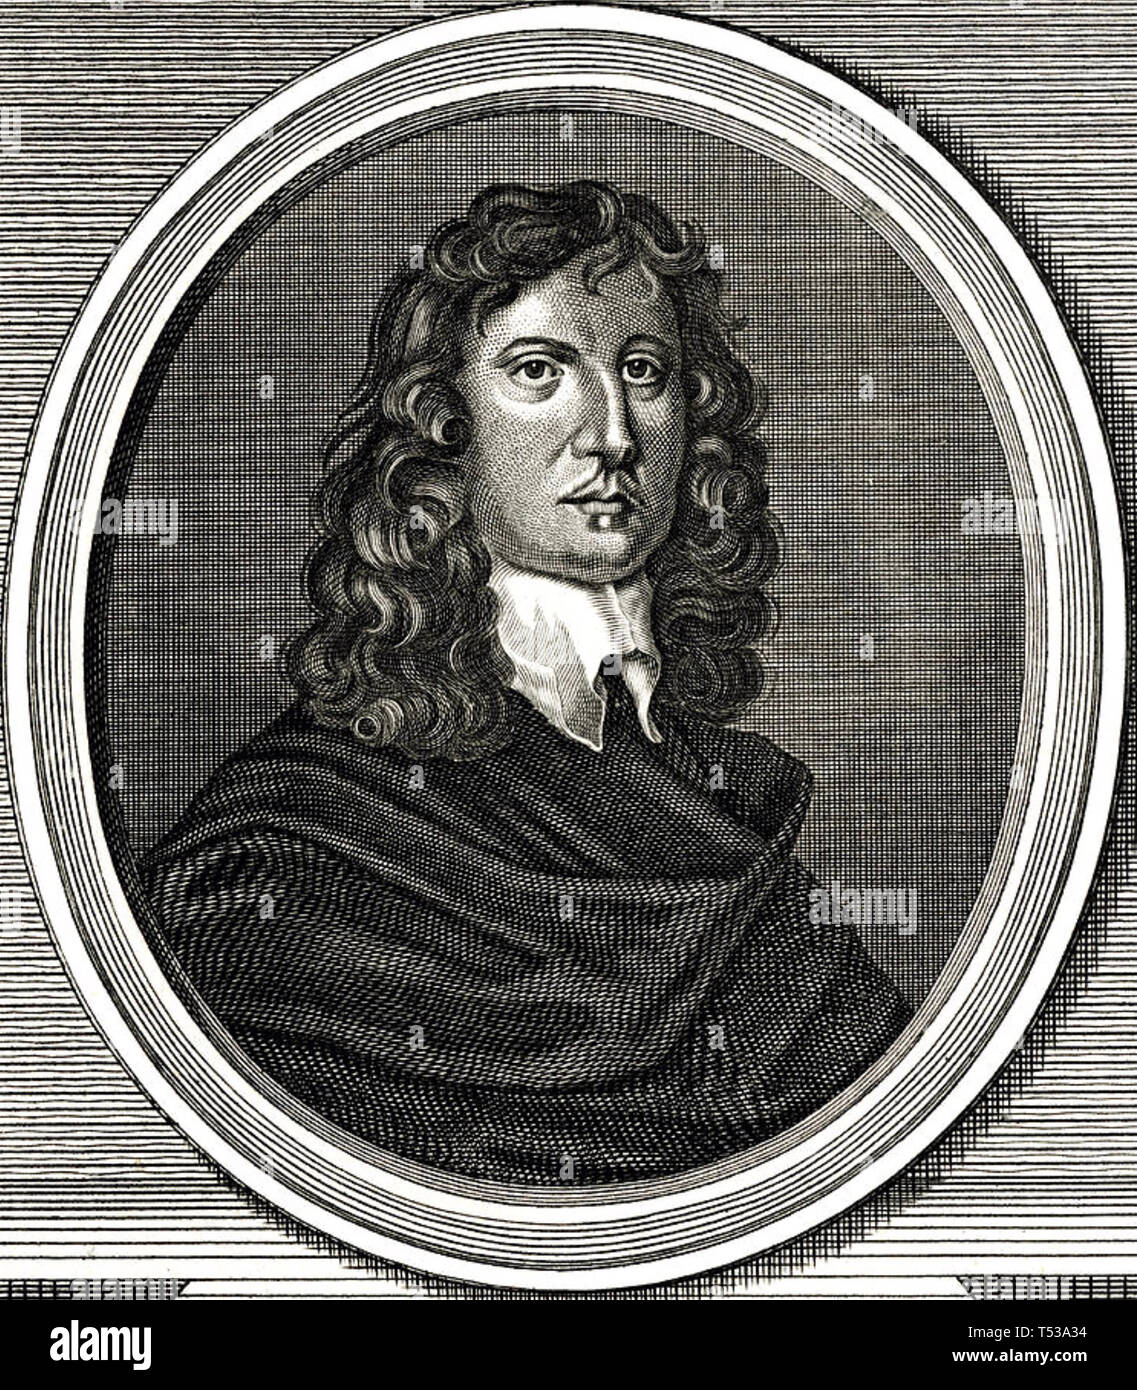 JAMES HARRINGTON (1611-1677) English political theorist - Stock Image